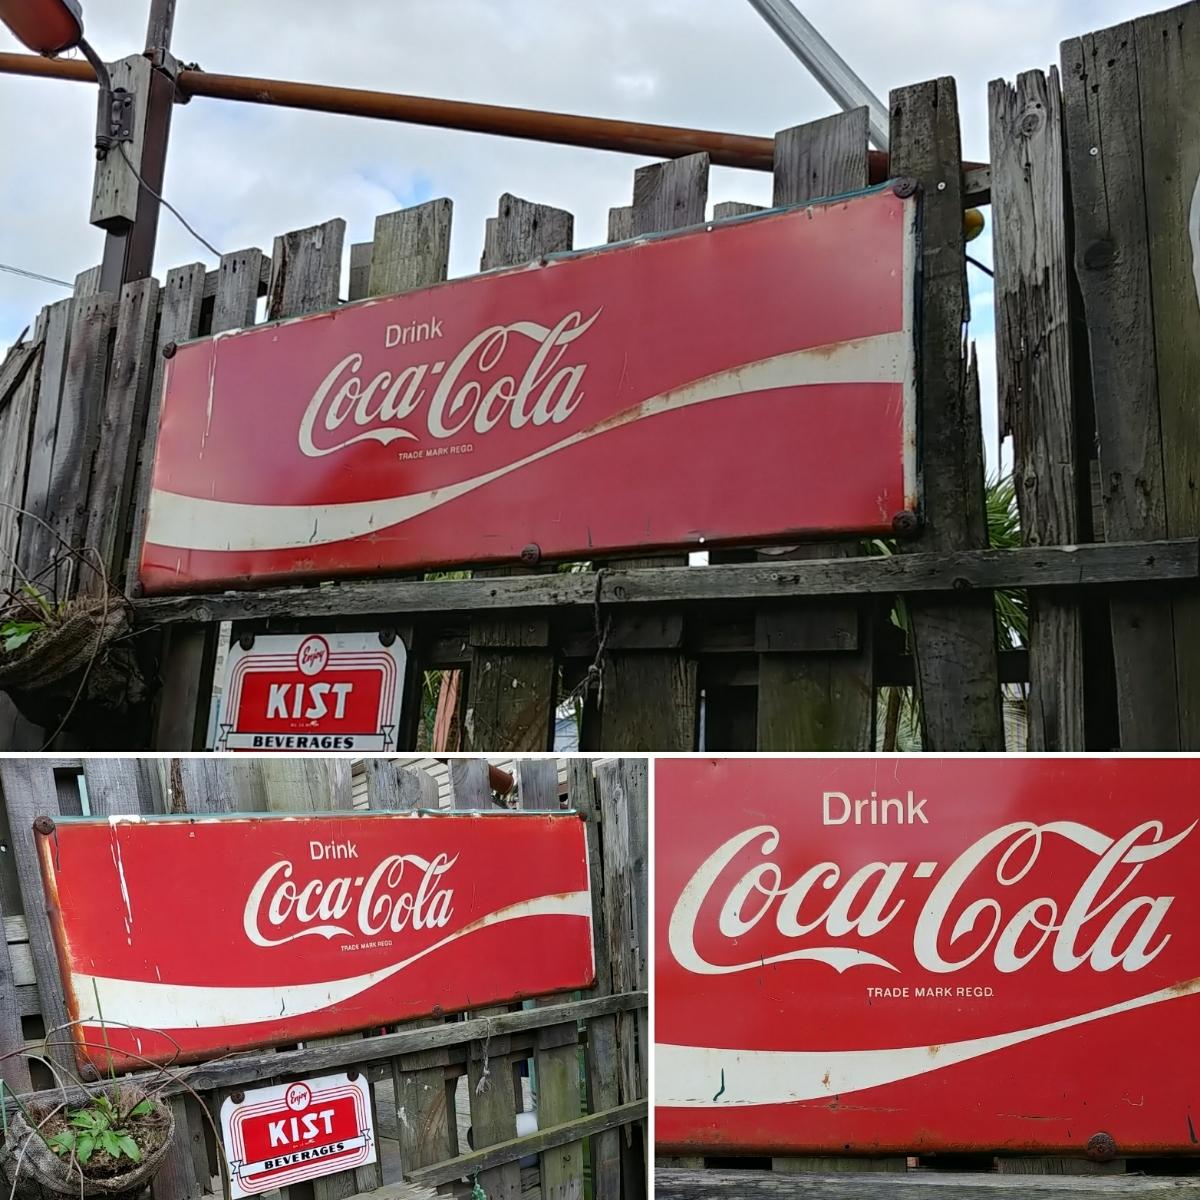 ☆AMERICAN VINTAGE SING☆Coca-Cola (コカ・コーラ)大型 フロント看板(非売品)#店舗什器#世田谷ベース #ガレージライフ_画像6